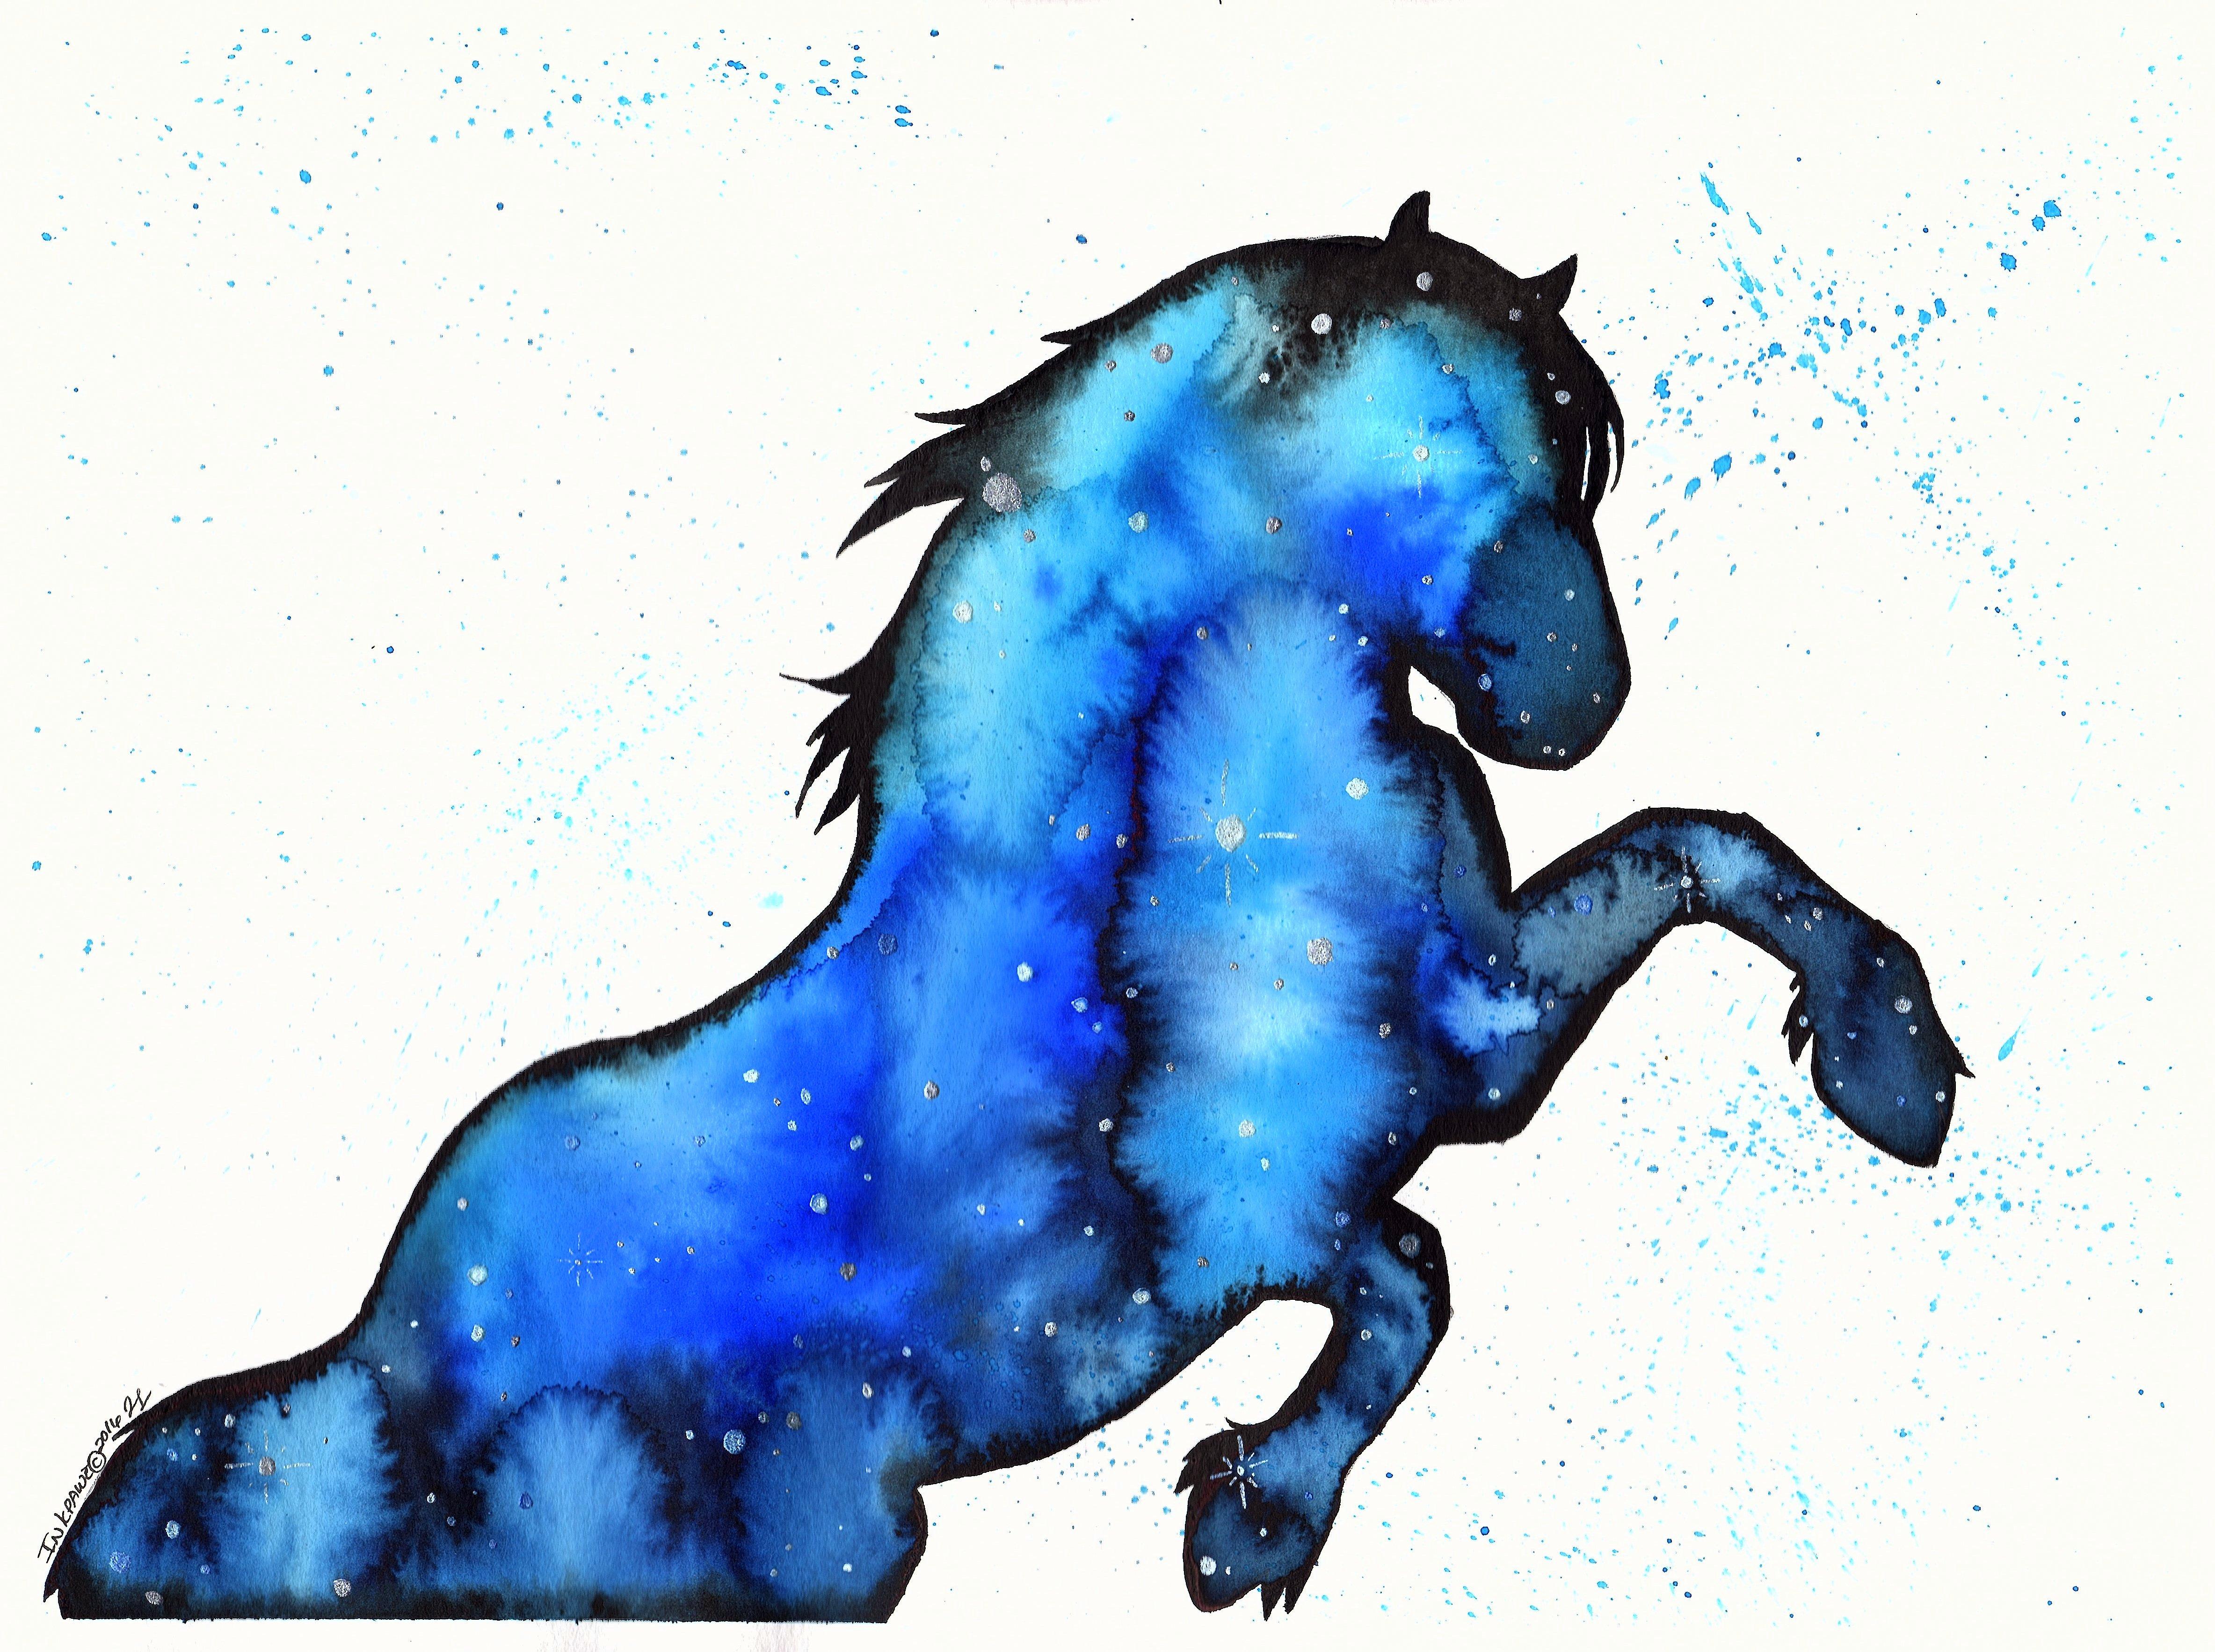 Galaxy Horse Inkpawz Art Online Store Powered By Storenvy